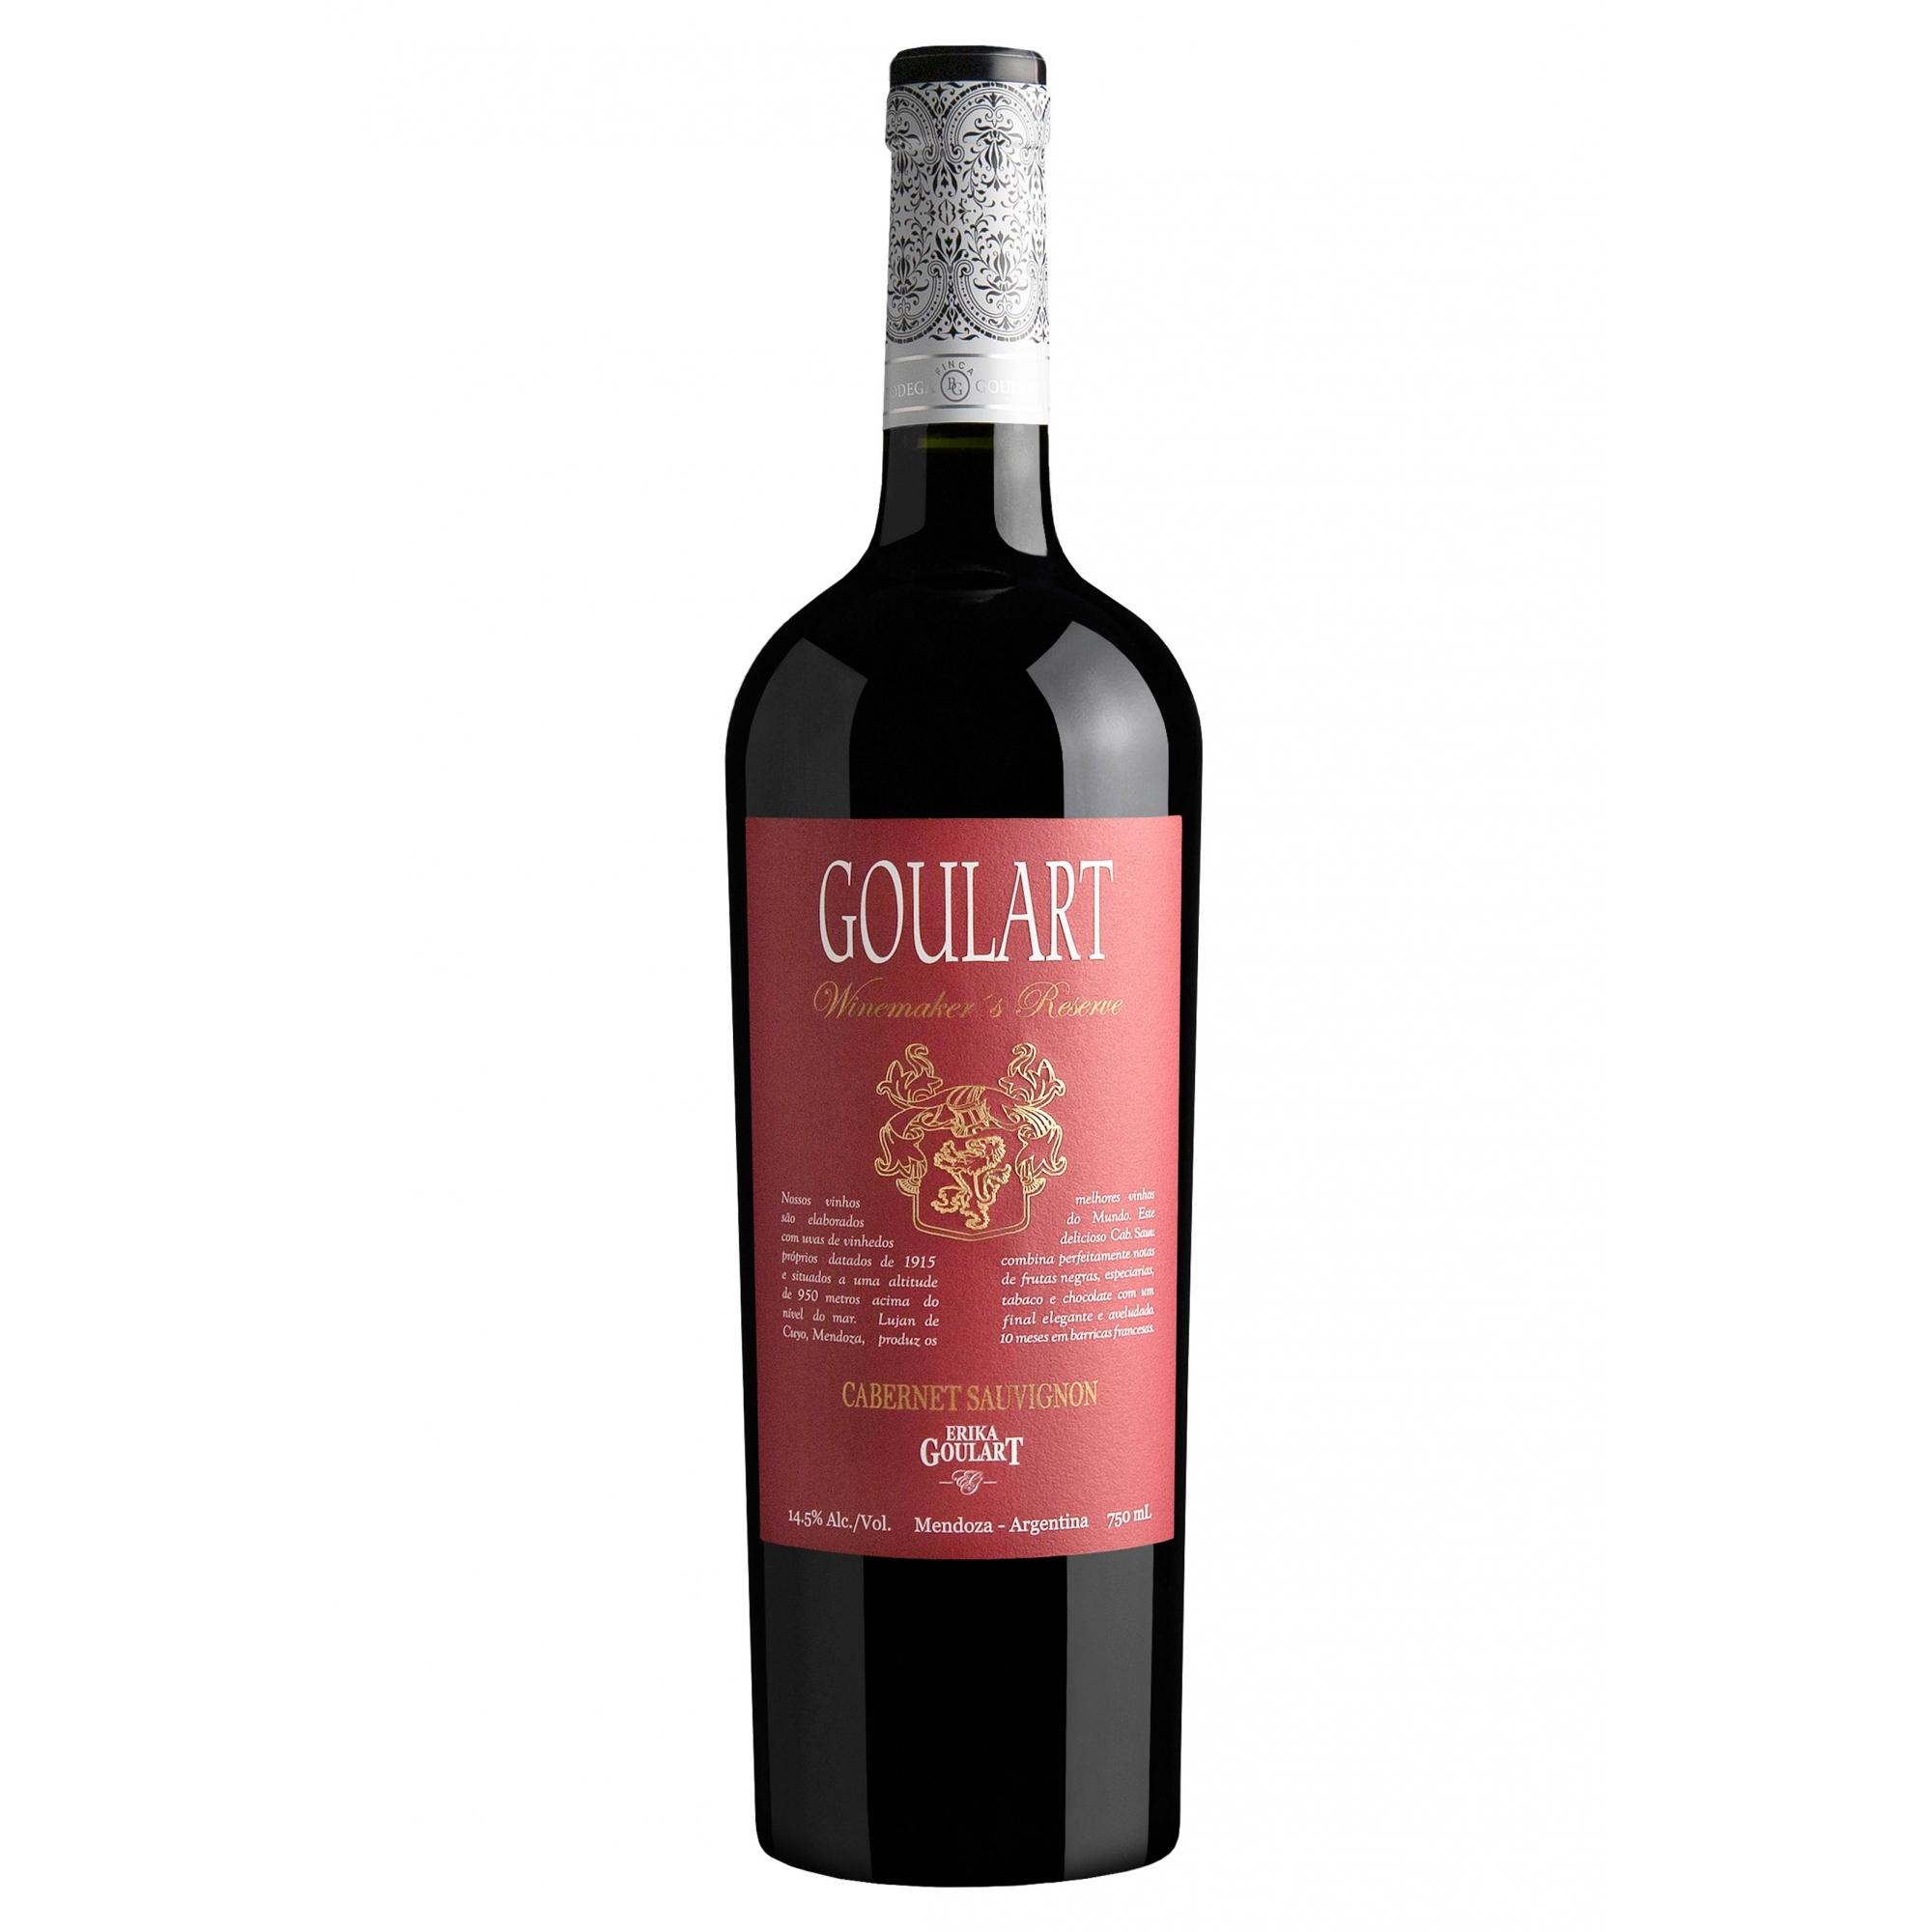 Goulart Winemaker´s Reserve Cabernet Sauvignon 2019 - 750ml